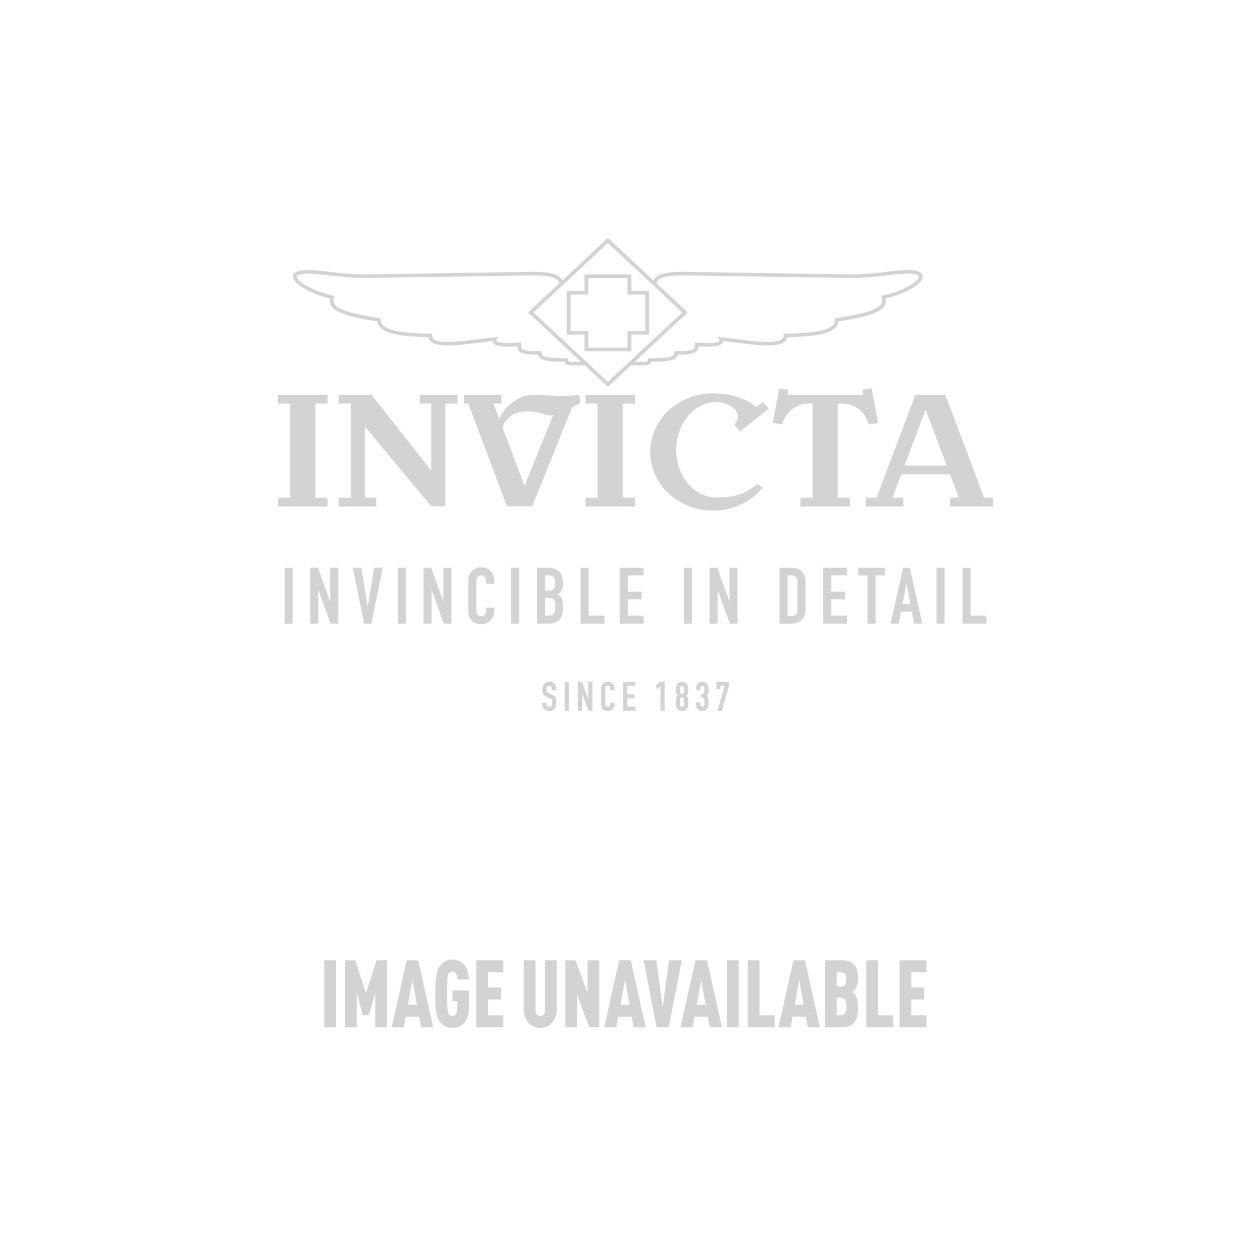 Invicta Sea Hunter Swiss Made Quartz Watch - Gunmetal case with Green tone Leather band - Model 18431